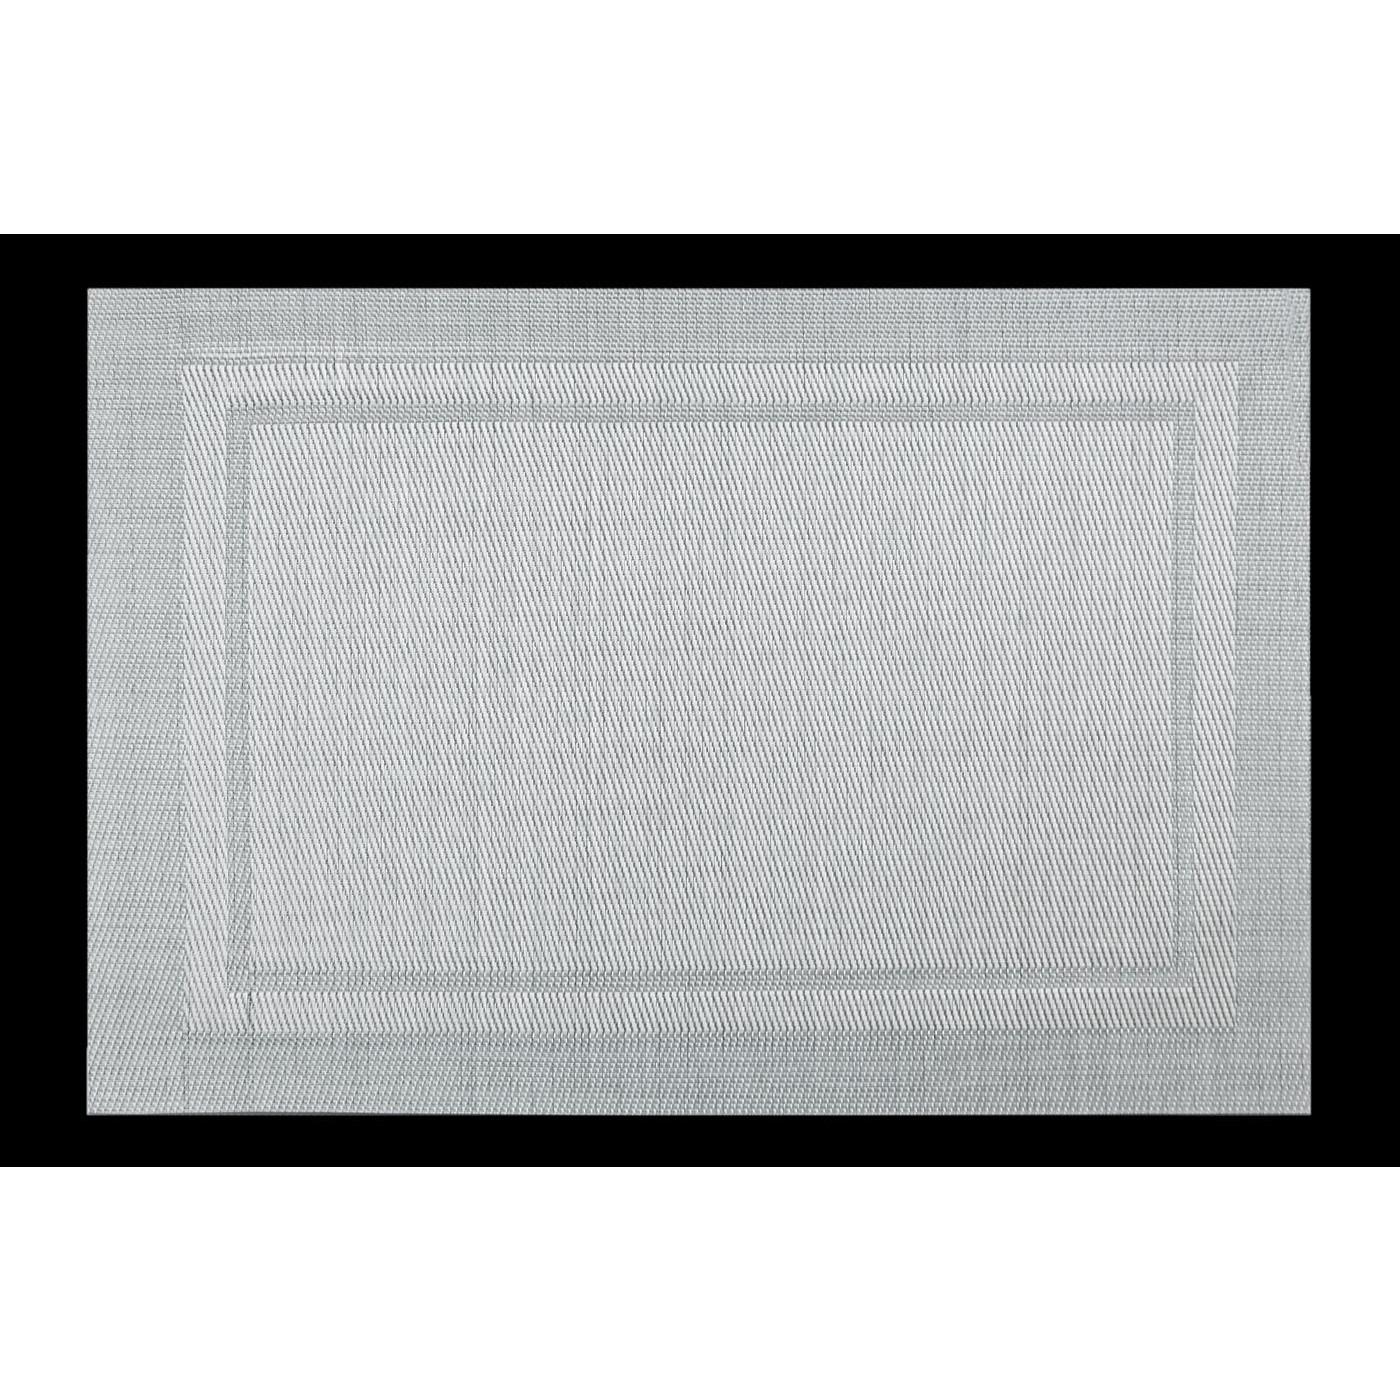 Srebrna podkładka stołowa klasyczna 30x45 cm